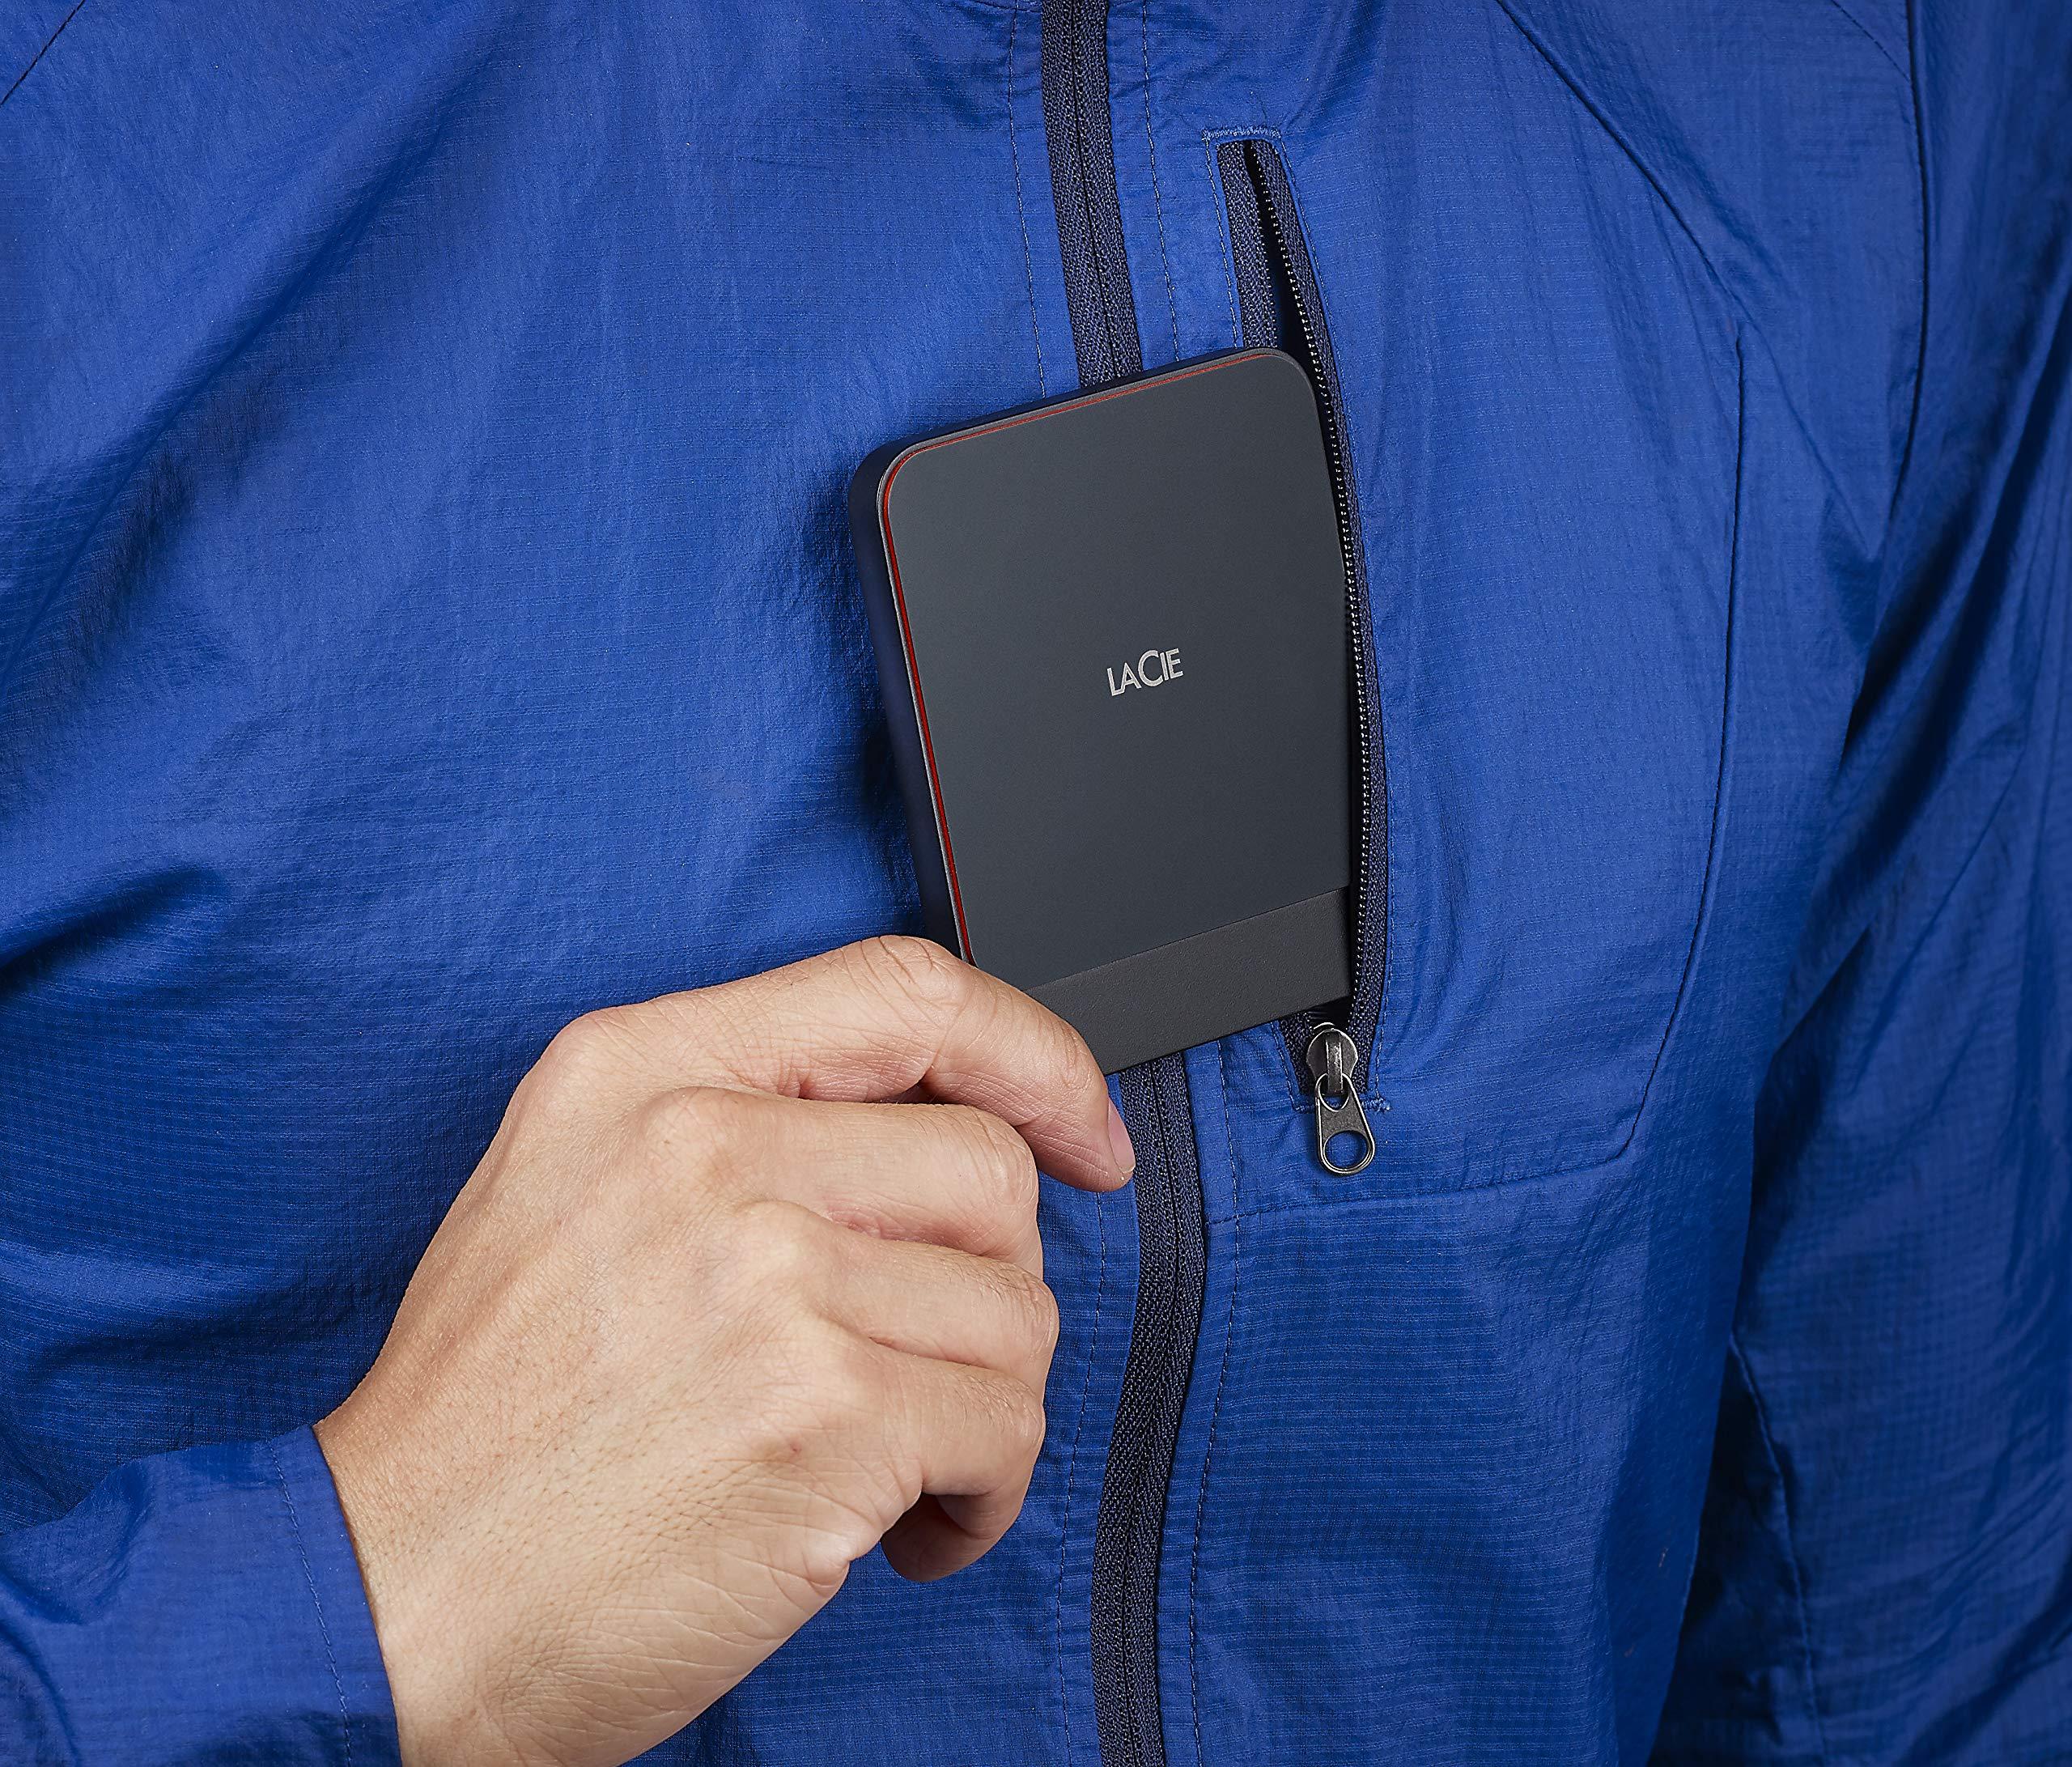 LaCie Portable SSD High Performance External SSD USB-C USB 3.0 1TB STHK1000800 by LaCie (Image #6)